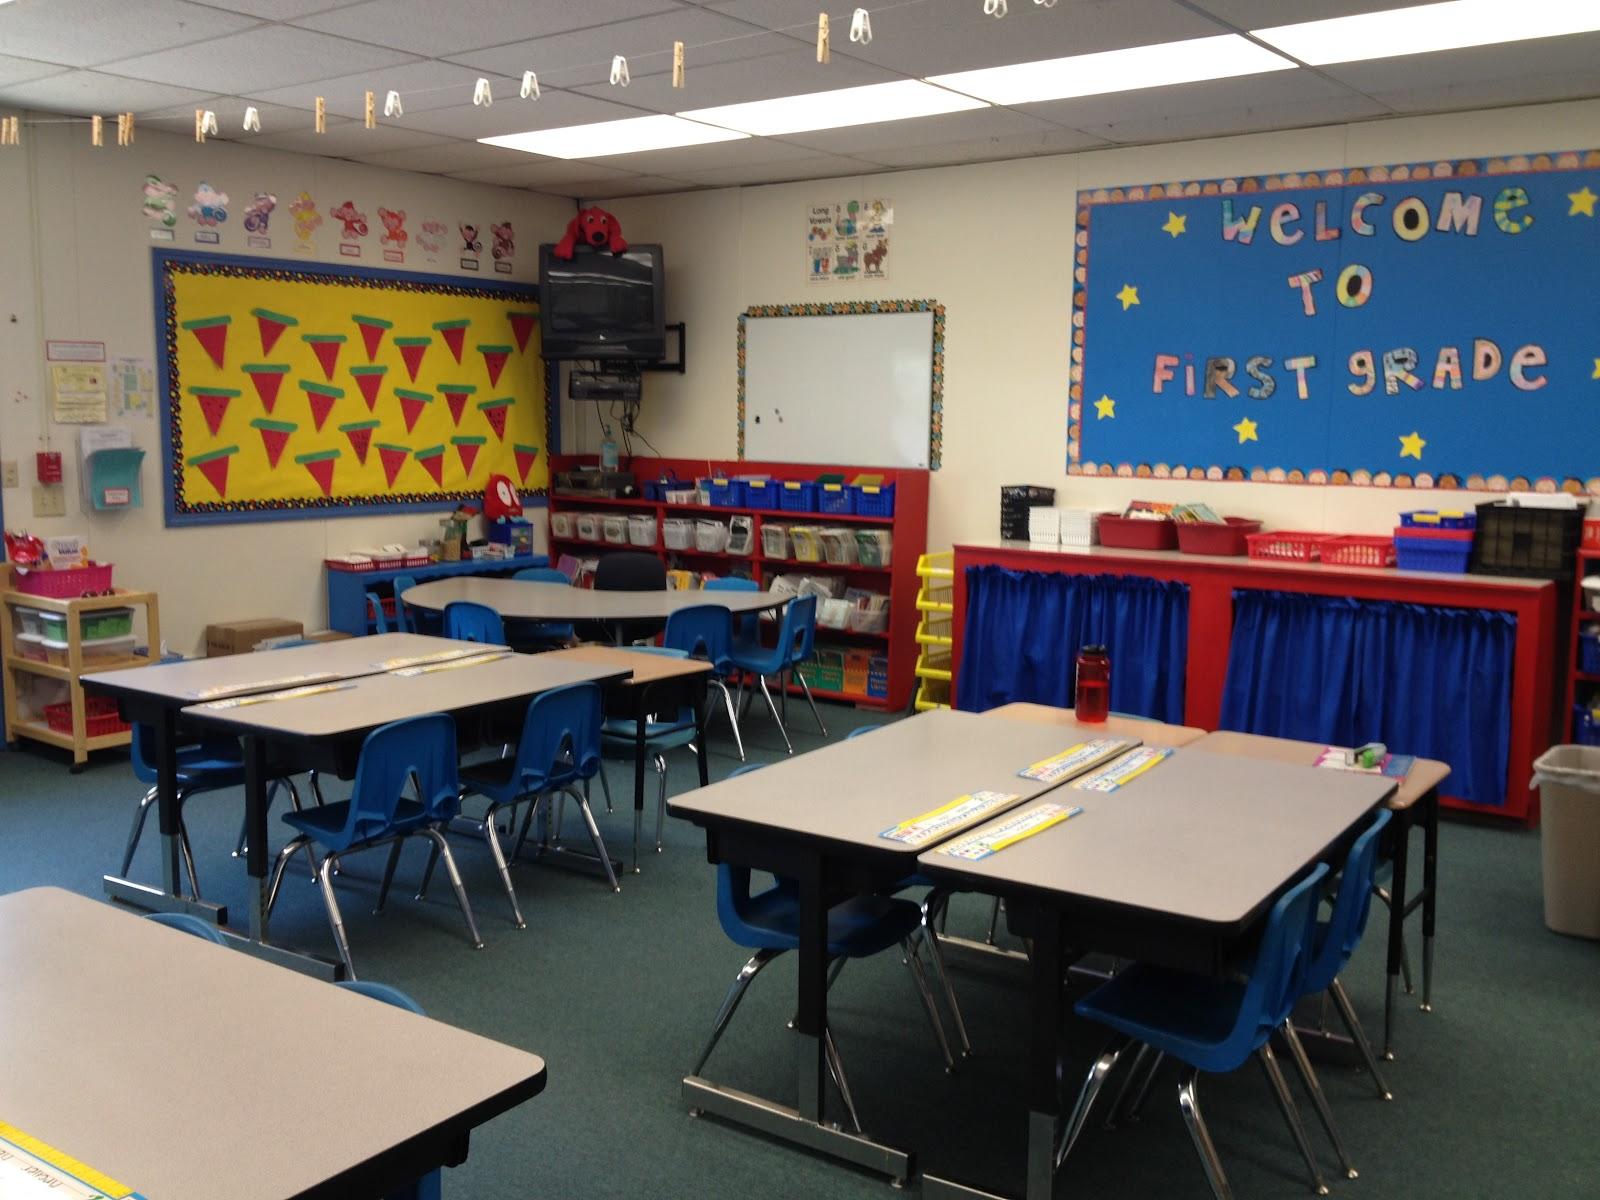 7th Grade Math Classroom Decorations ~ Teacher idea factory where i teach wednesday